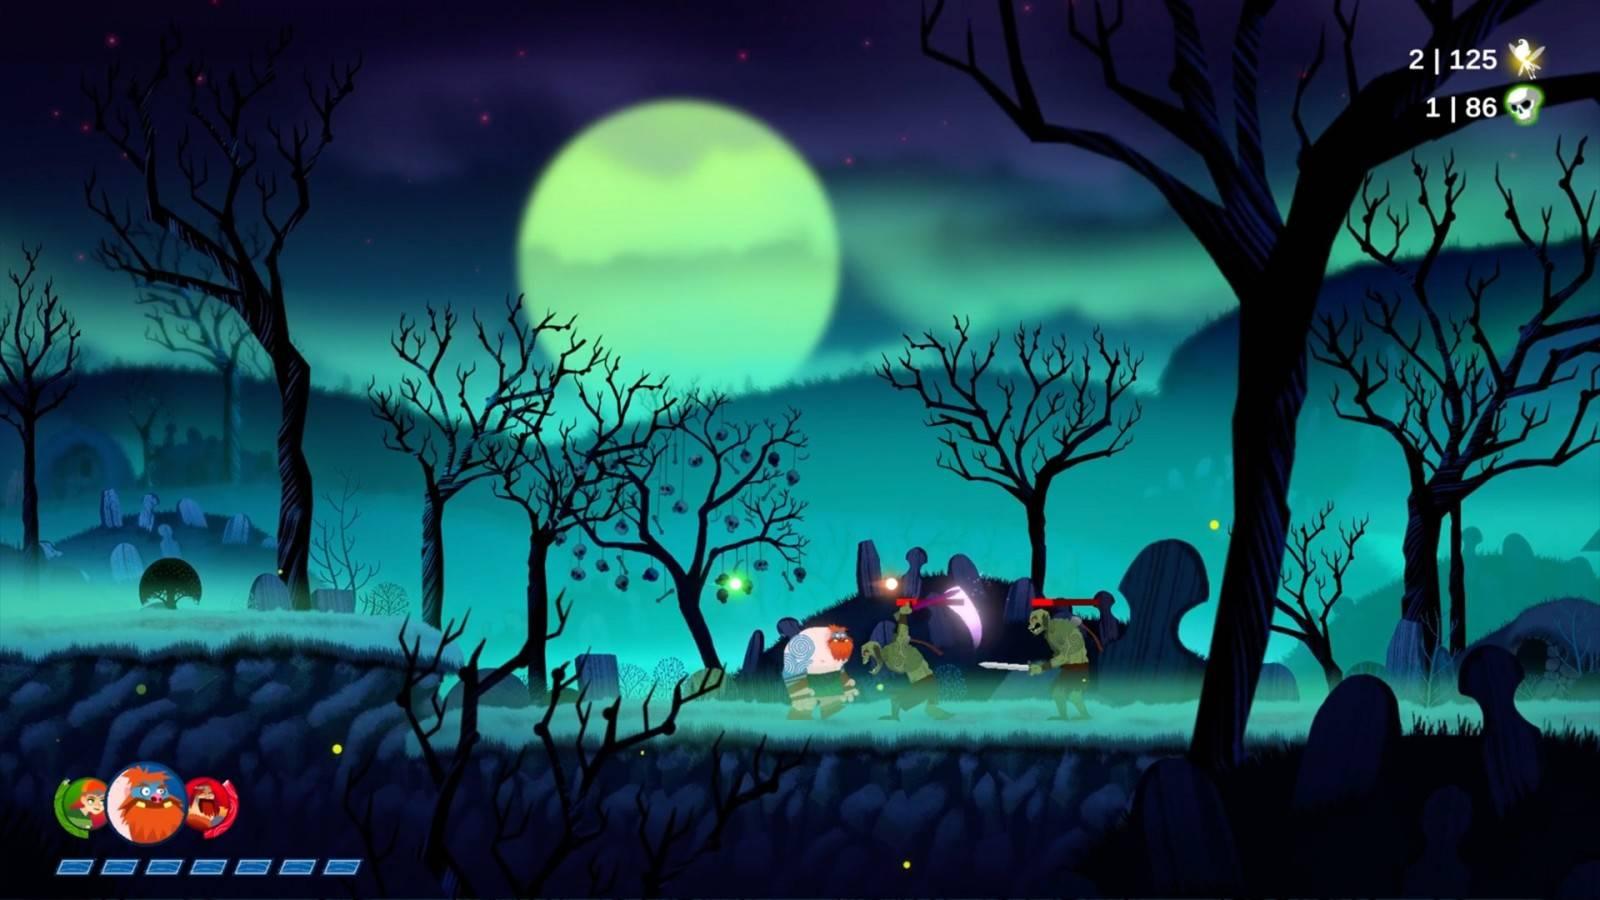 Clan O'Conall and the Crown of the Stag: El juego de plataforma llega a Steam 3